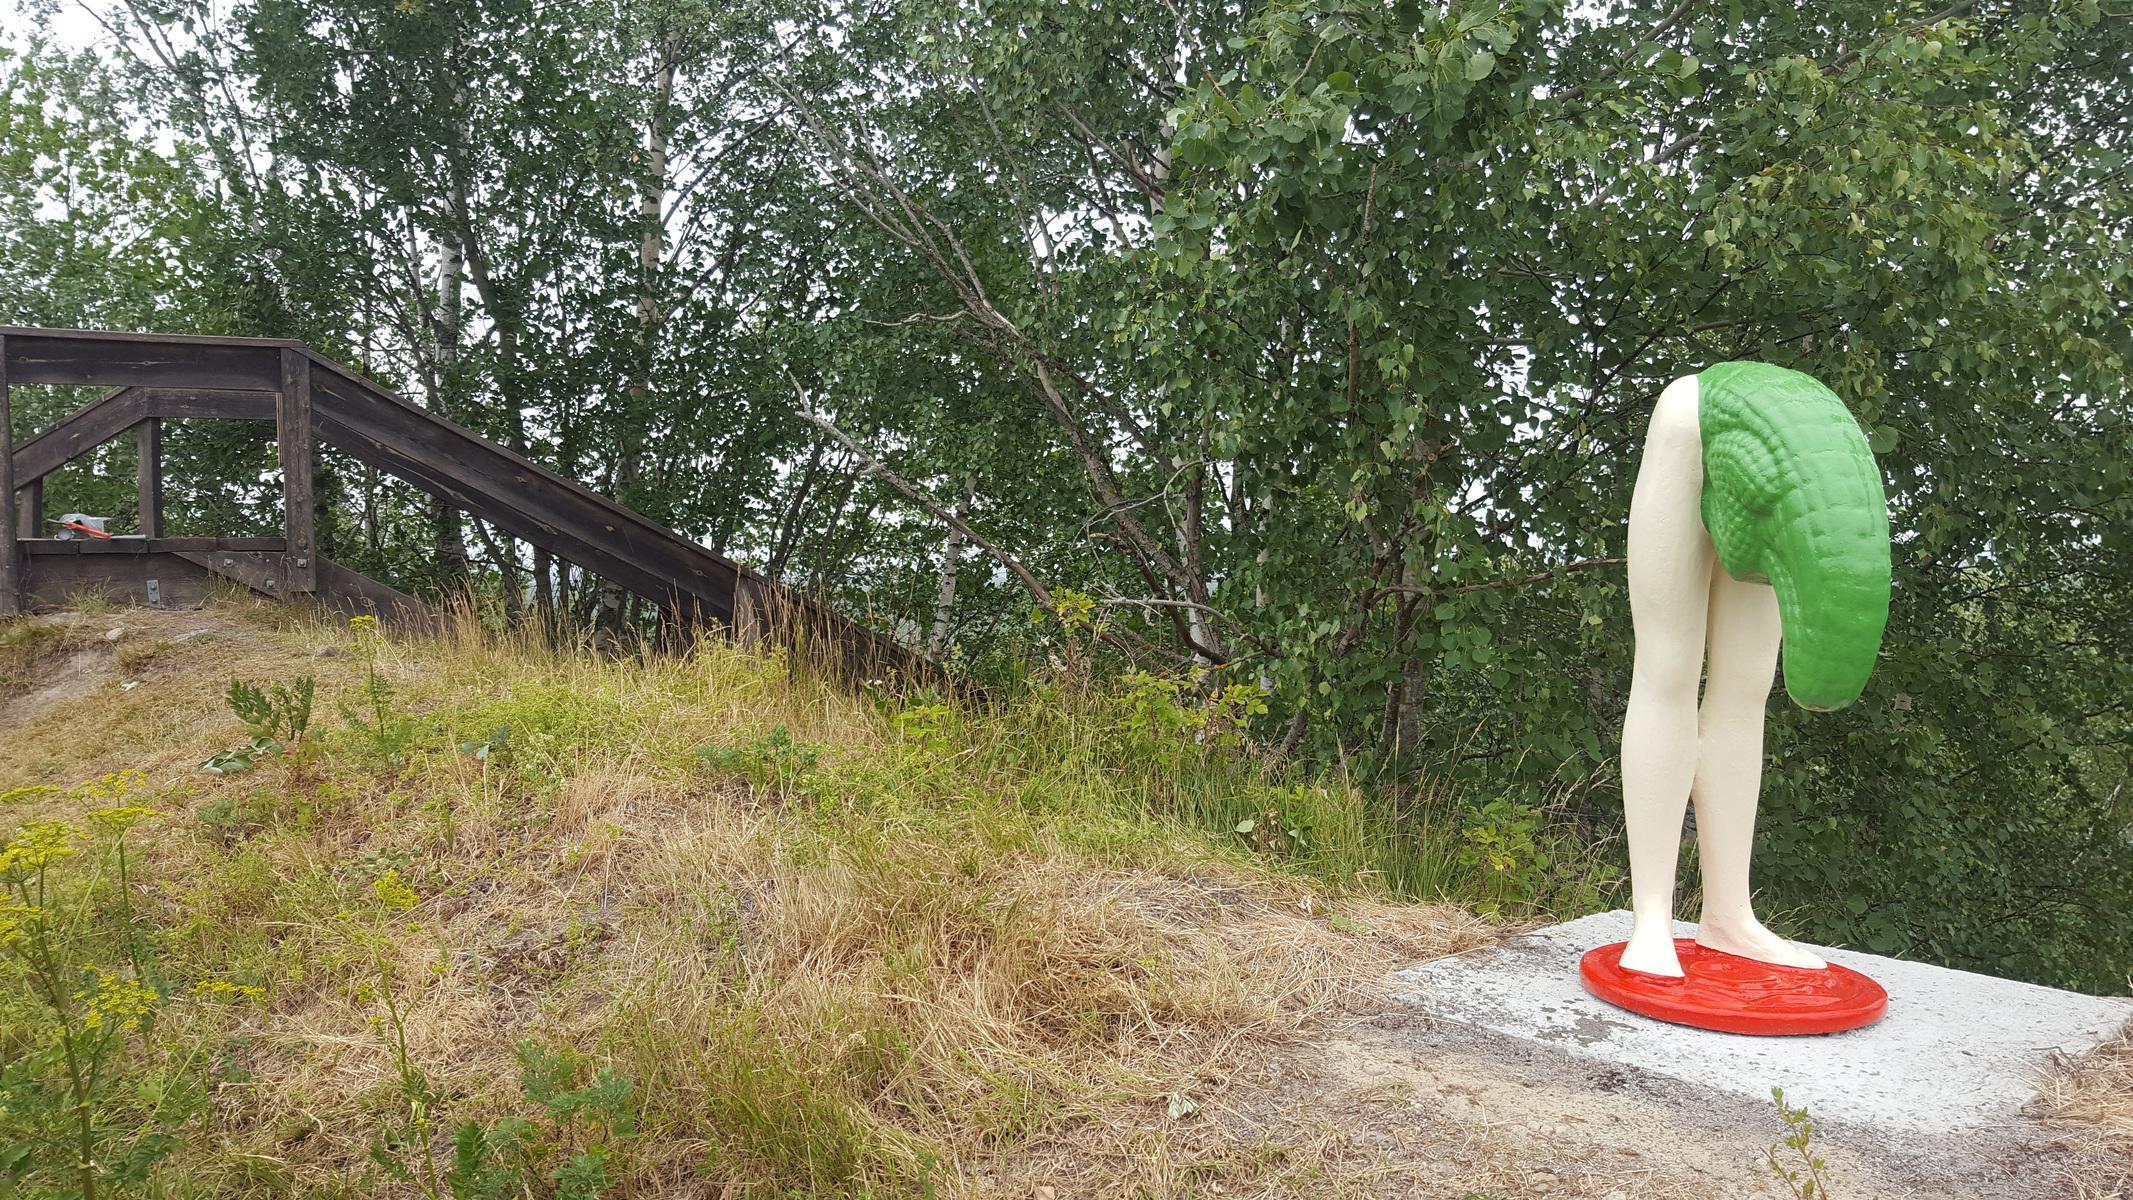 www.lenaflodman.com - Mr Majestät, painted aluminum 2018. Permanently placed at Konst på Hög, Kumla.